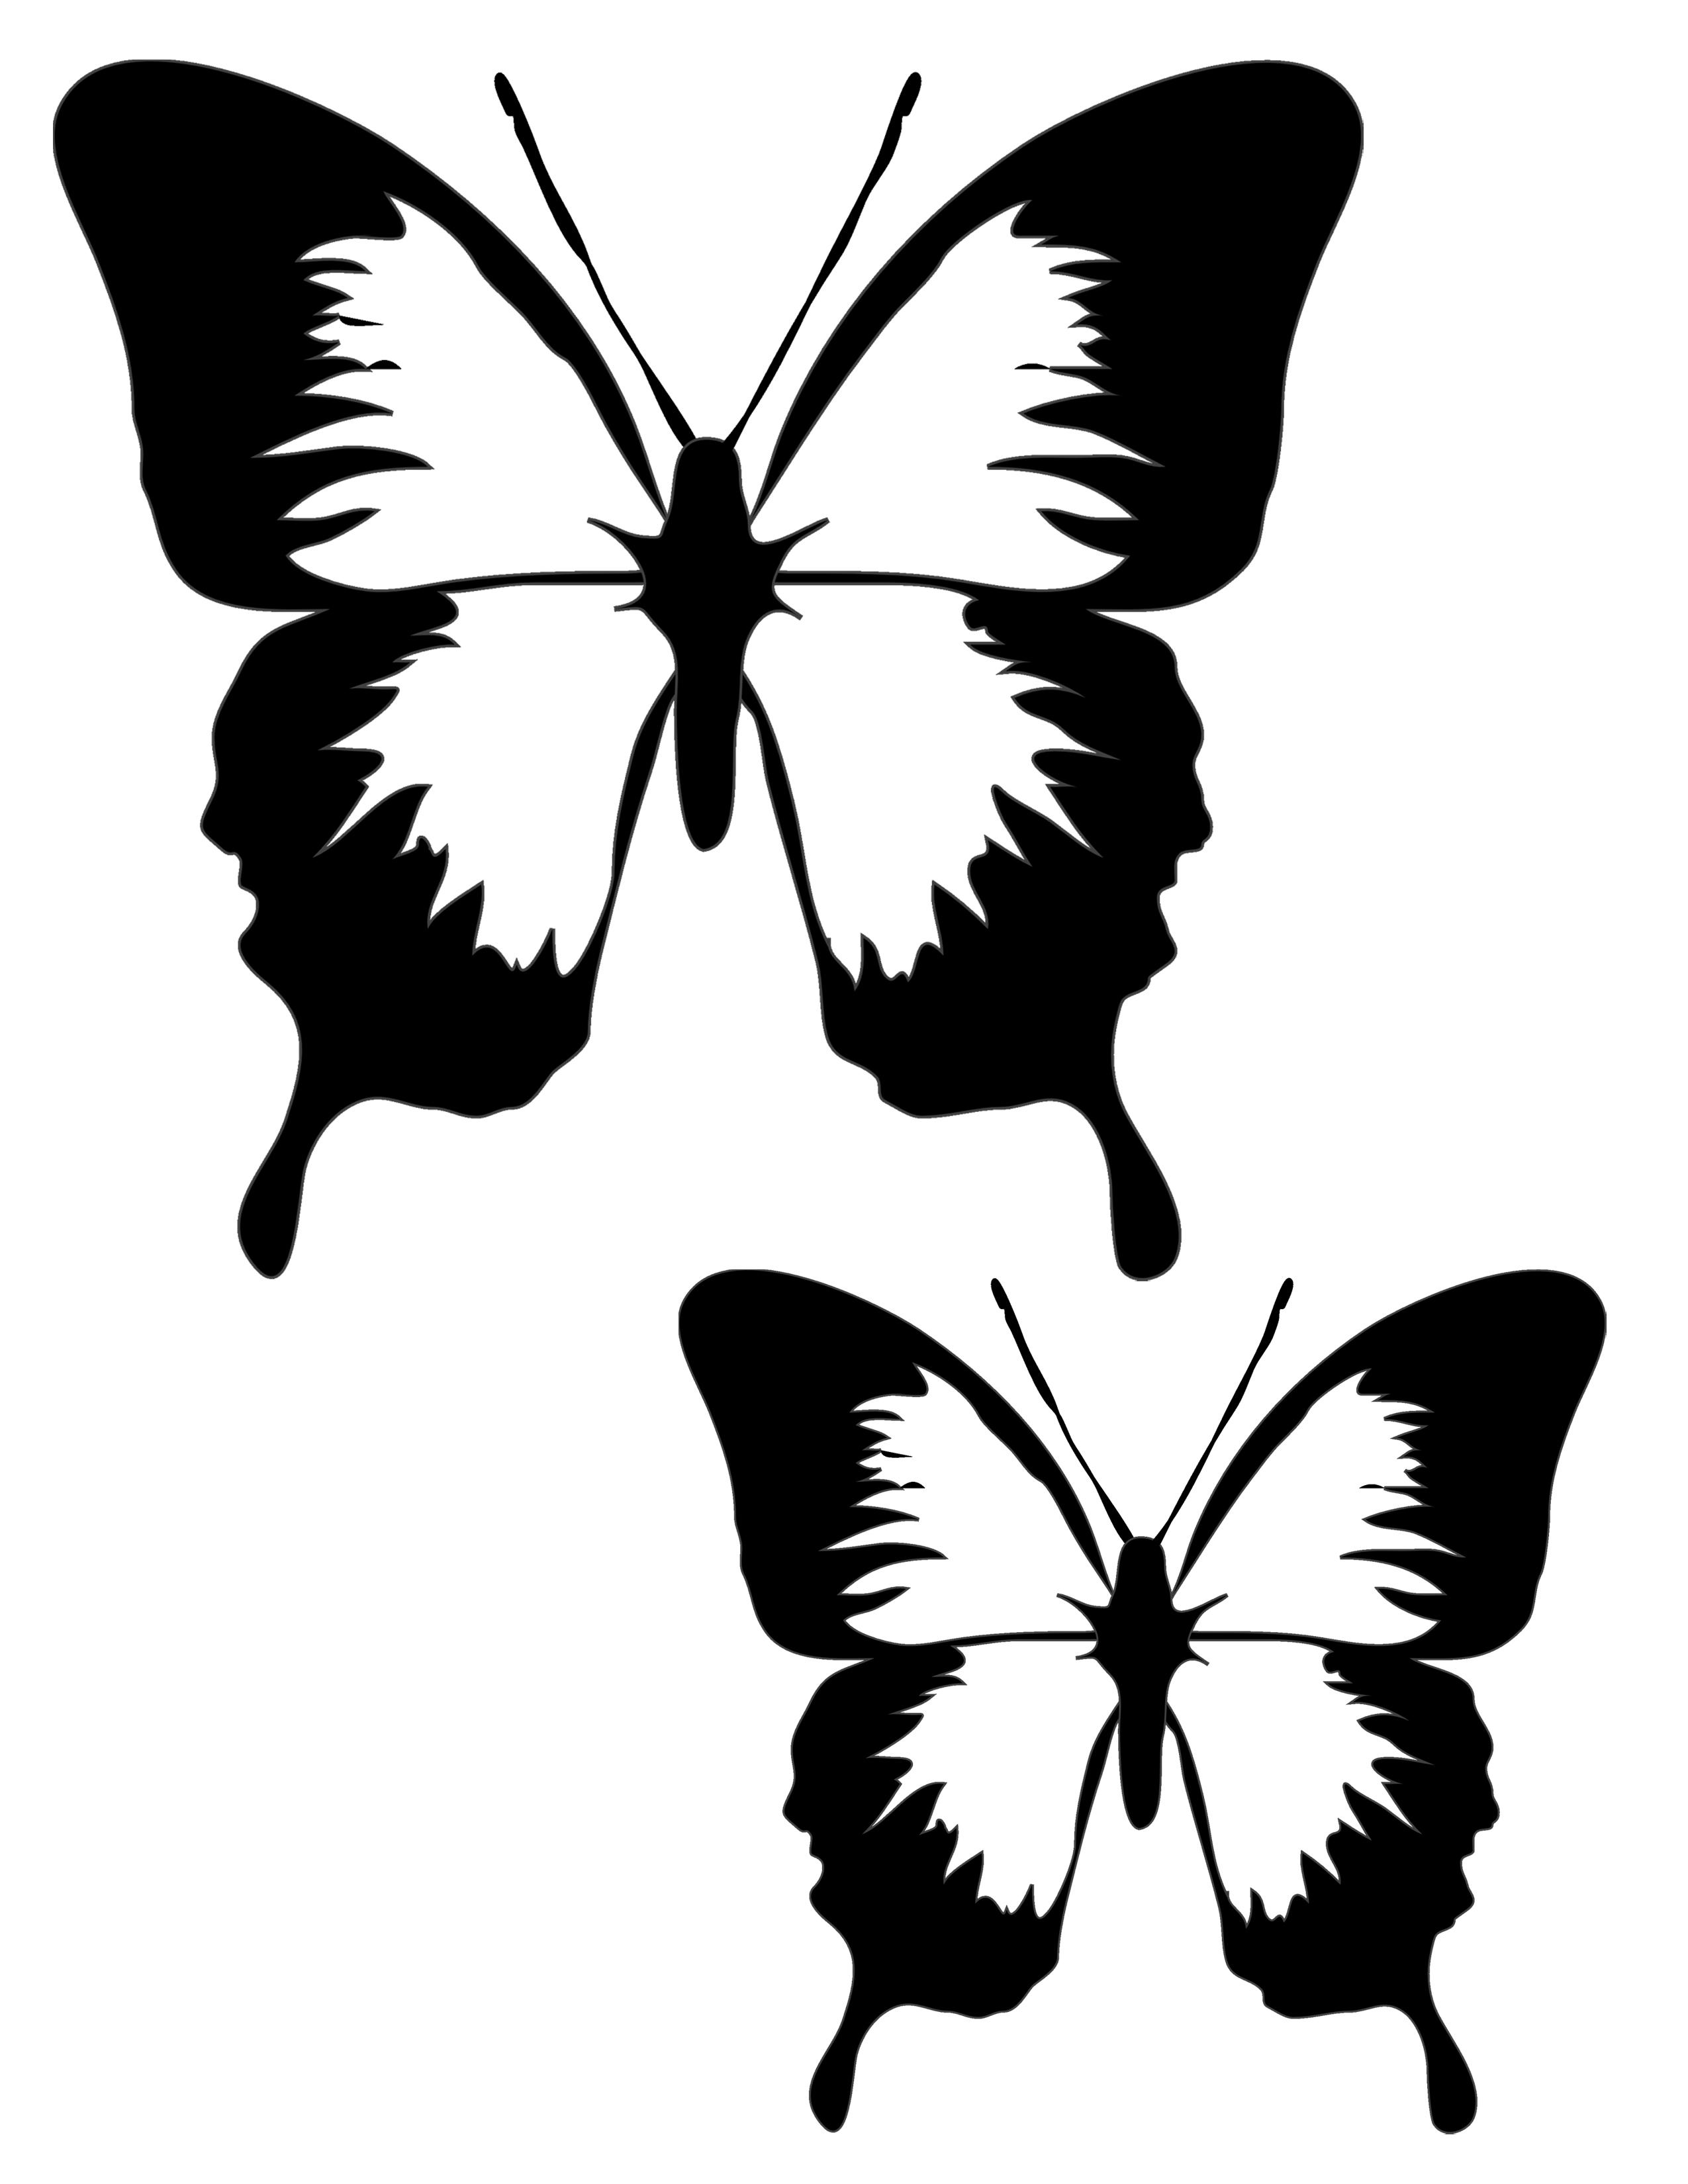 Butterfly clipart scene. Tissue paper sun catchers